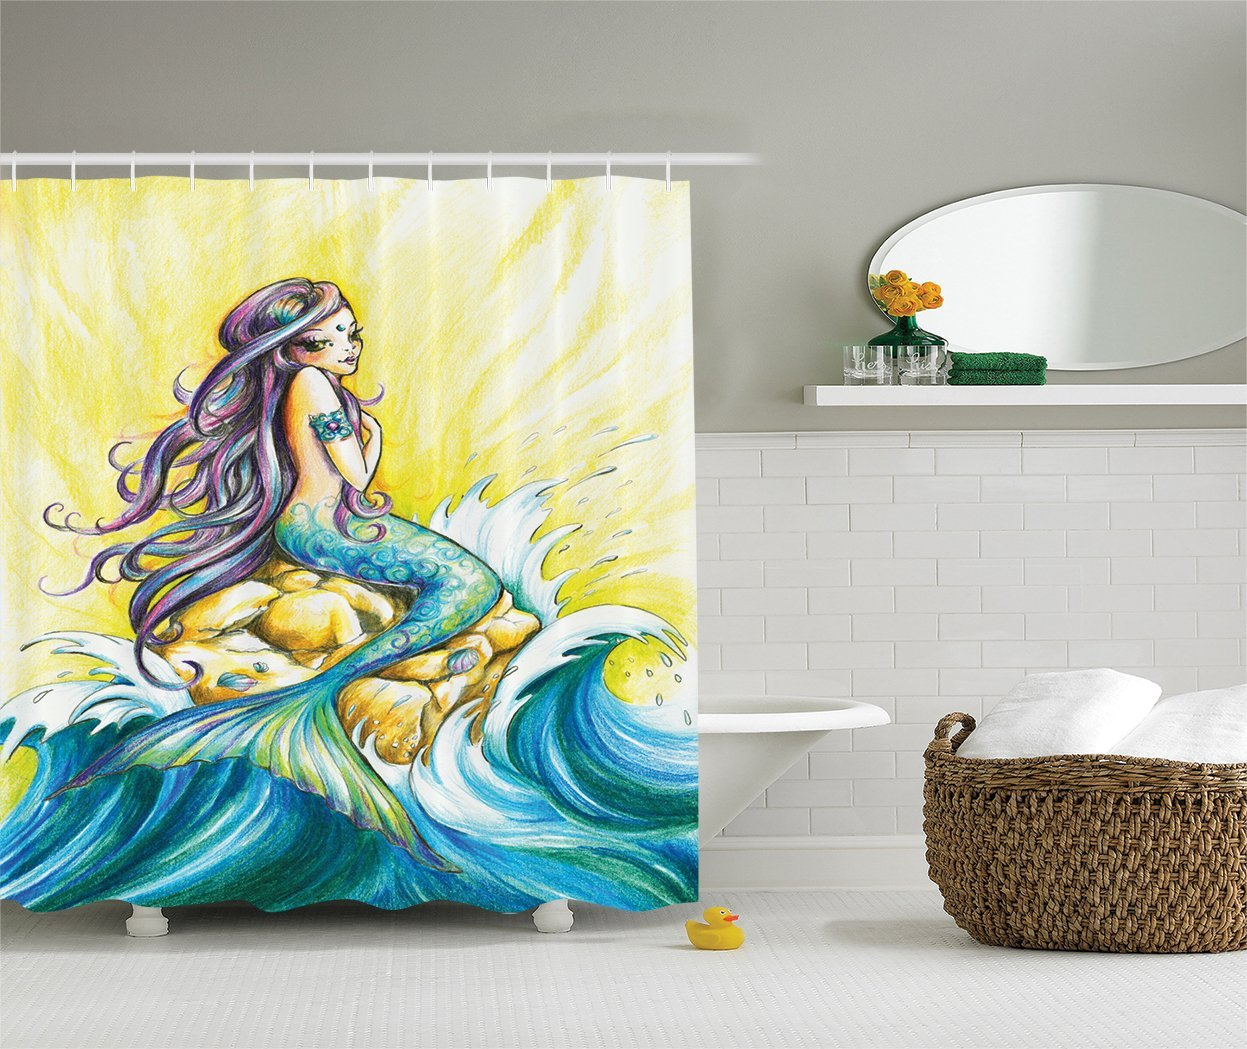 Little Mermaid Shower Curtain Decorations Mermaid Sitting On